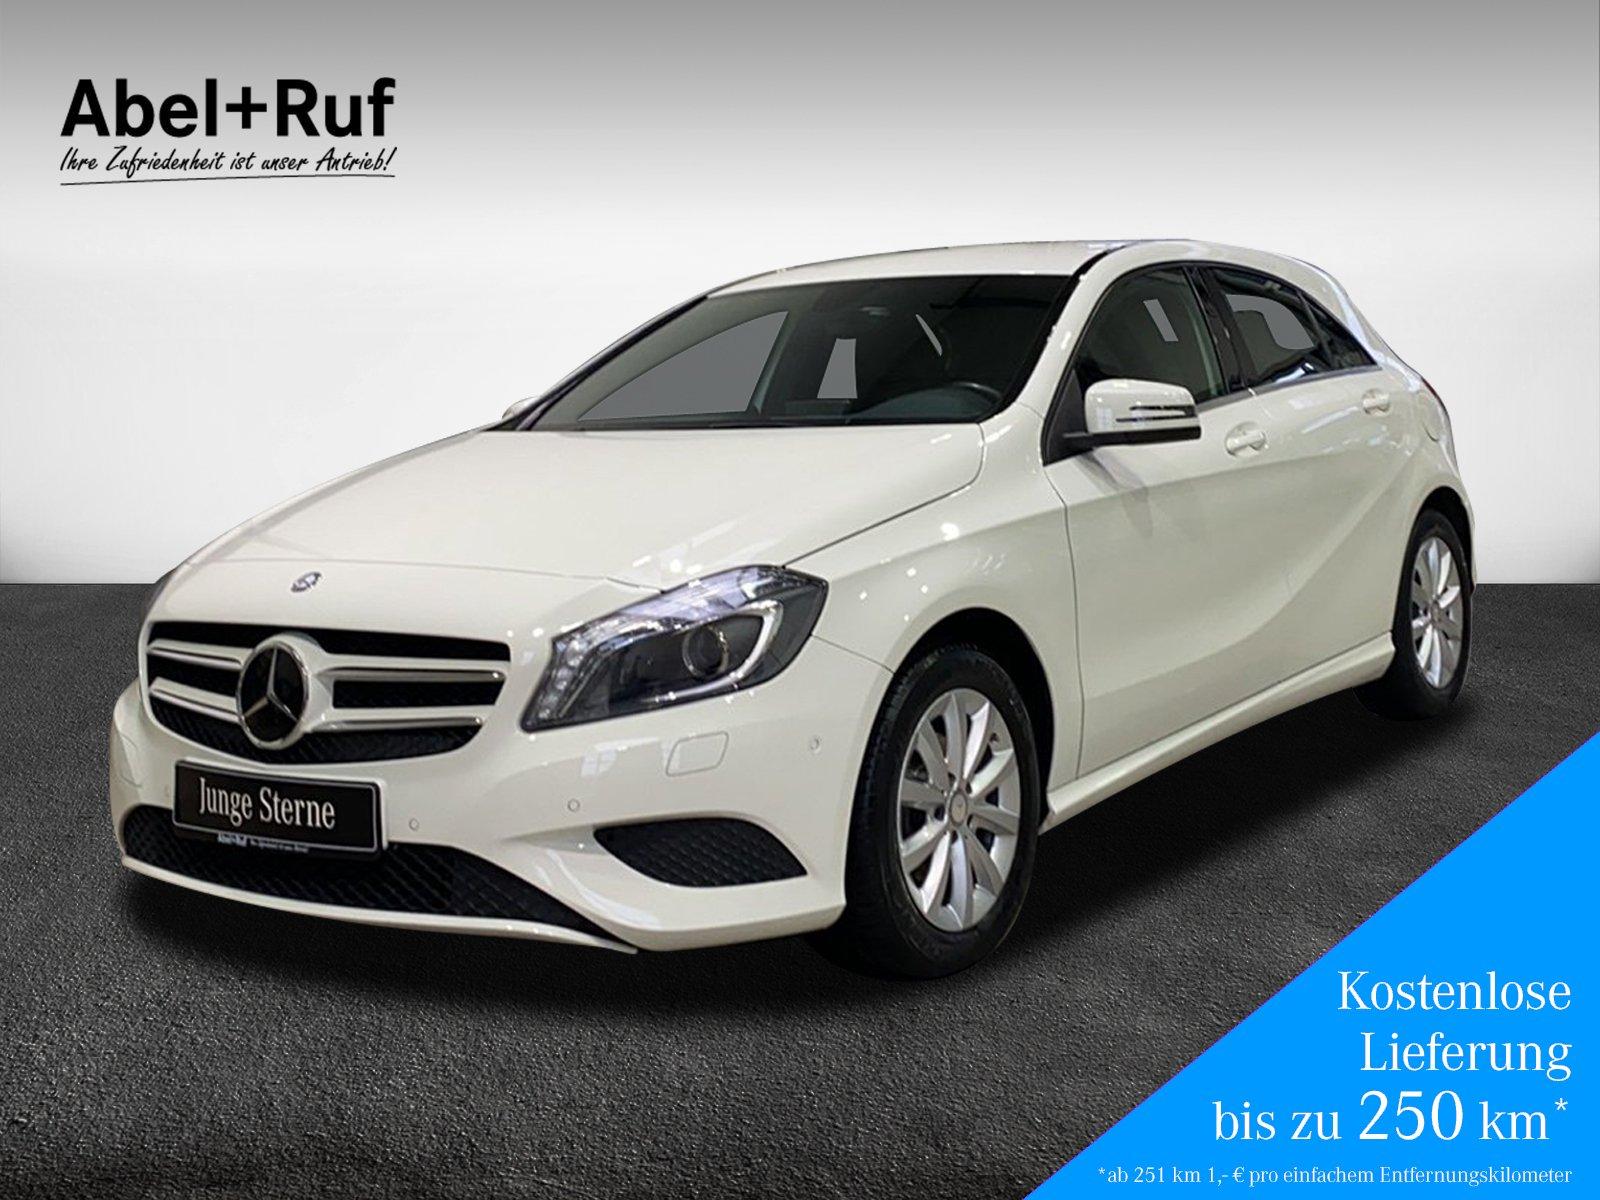 Mercedes-Benz A 180 CDI+Navigation+Bi-Xenon+Klima+Akt. PTS+SHZ, Jahr 2014, Diesel